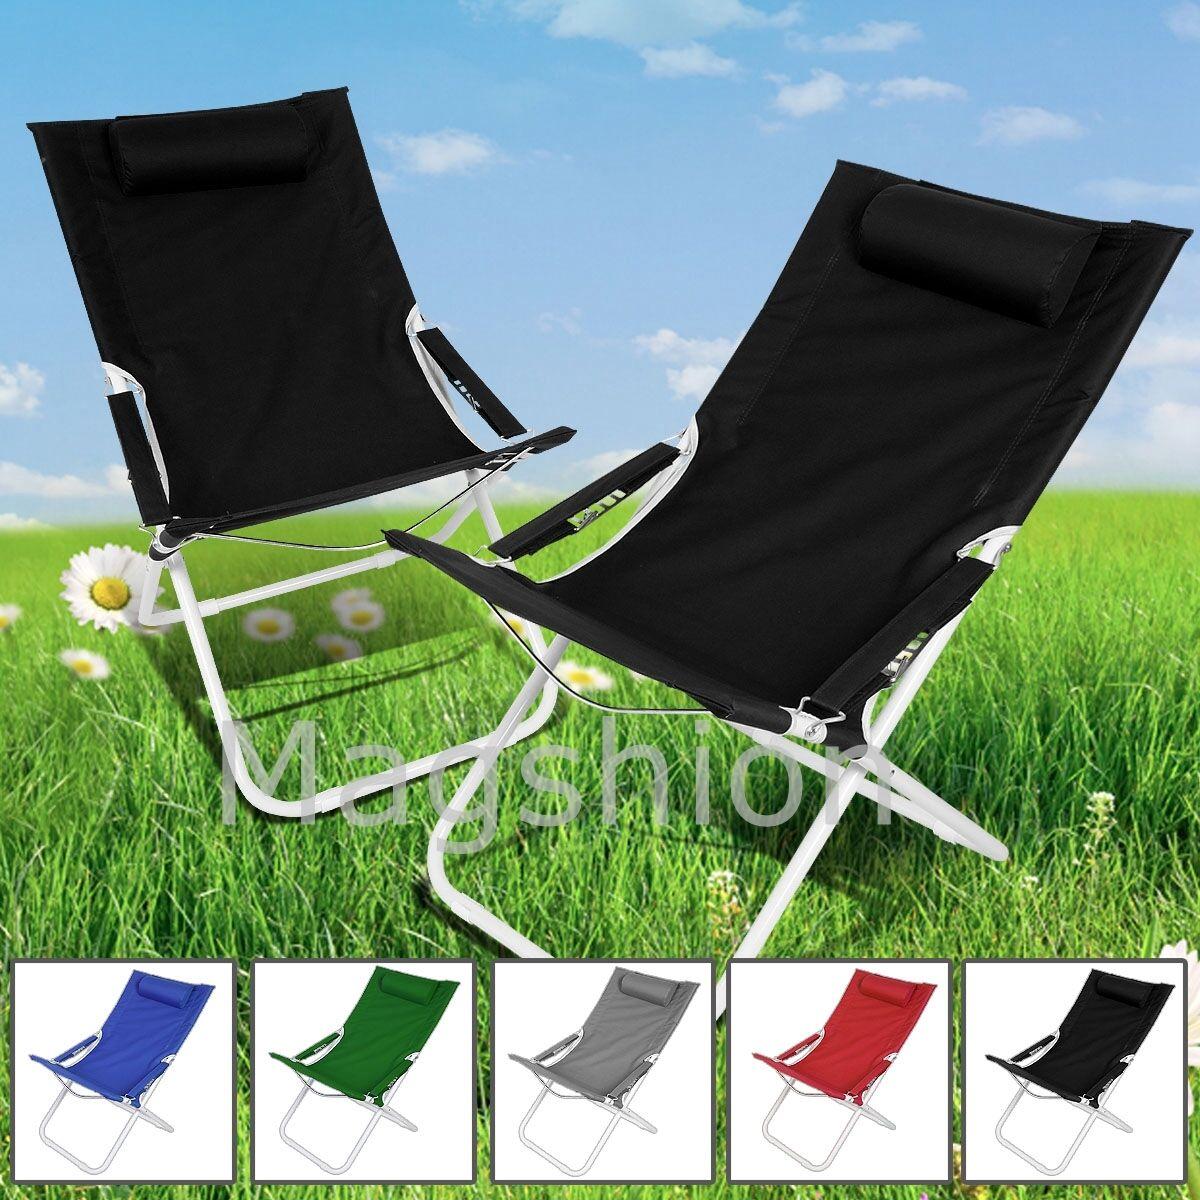 Black Curved Chair Folding Lounge Reclining Patio Pool Beach